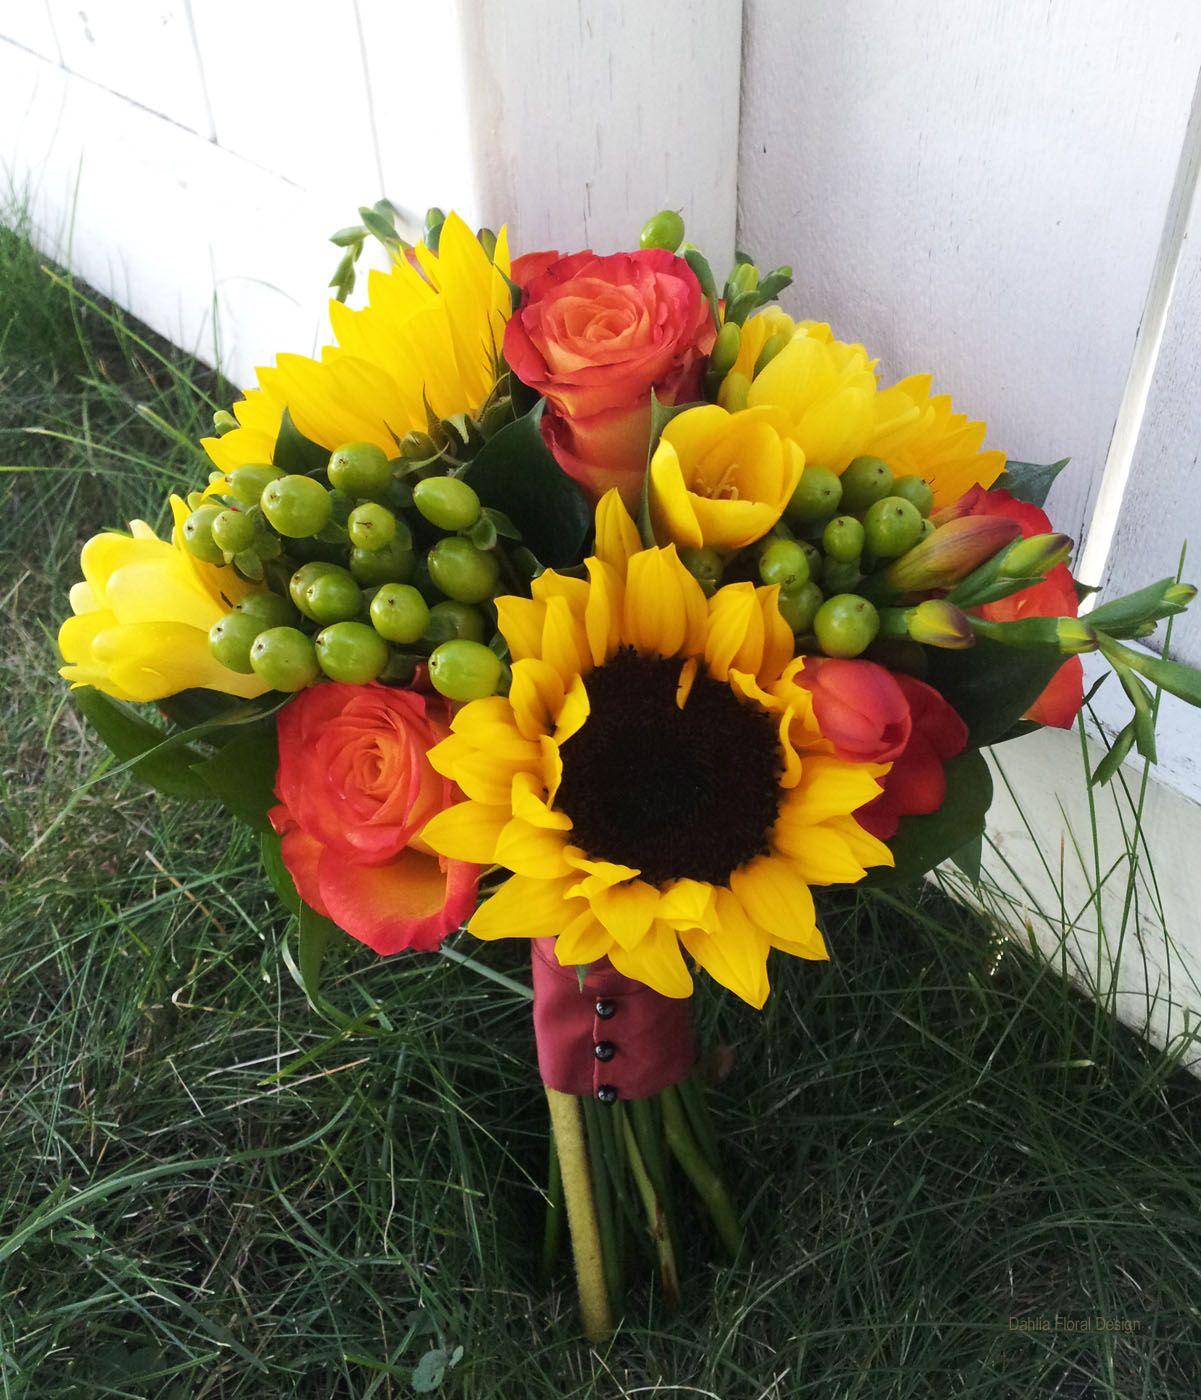 Wedding bouquets of sunflowers  sunflower wedding bouquets  Sunflower handtied wedding bouquet with